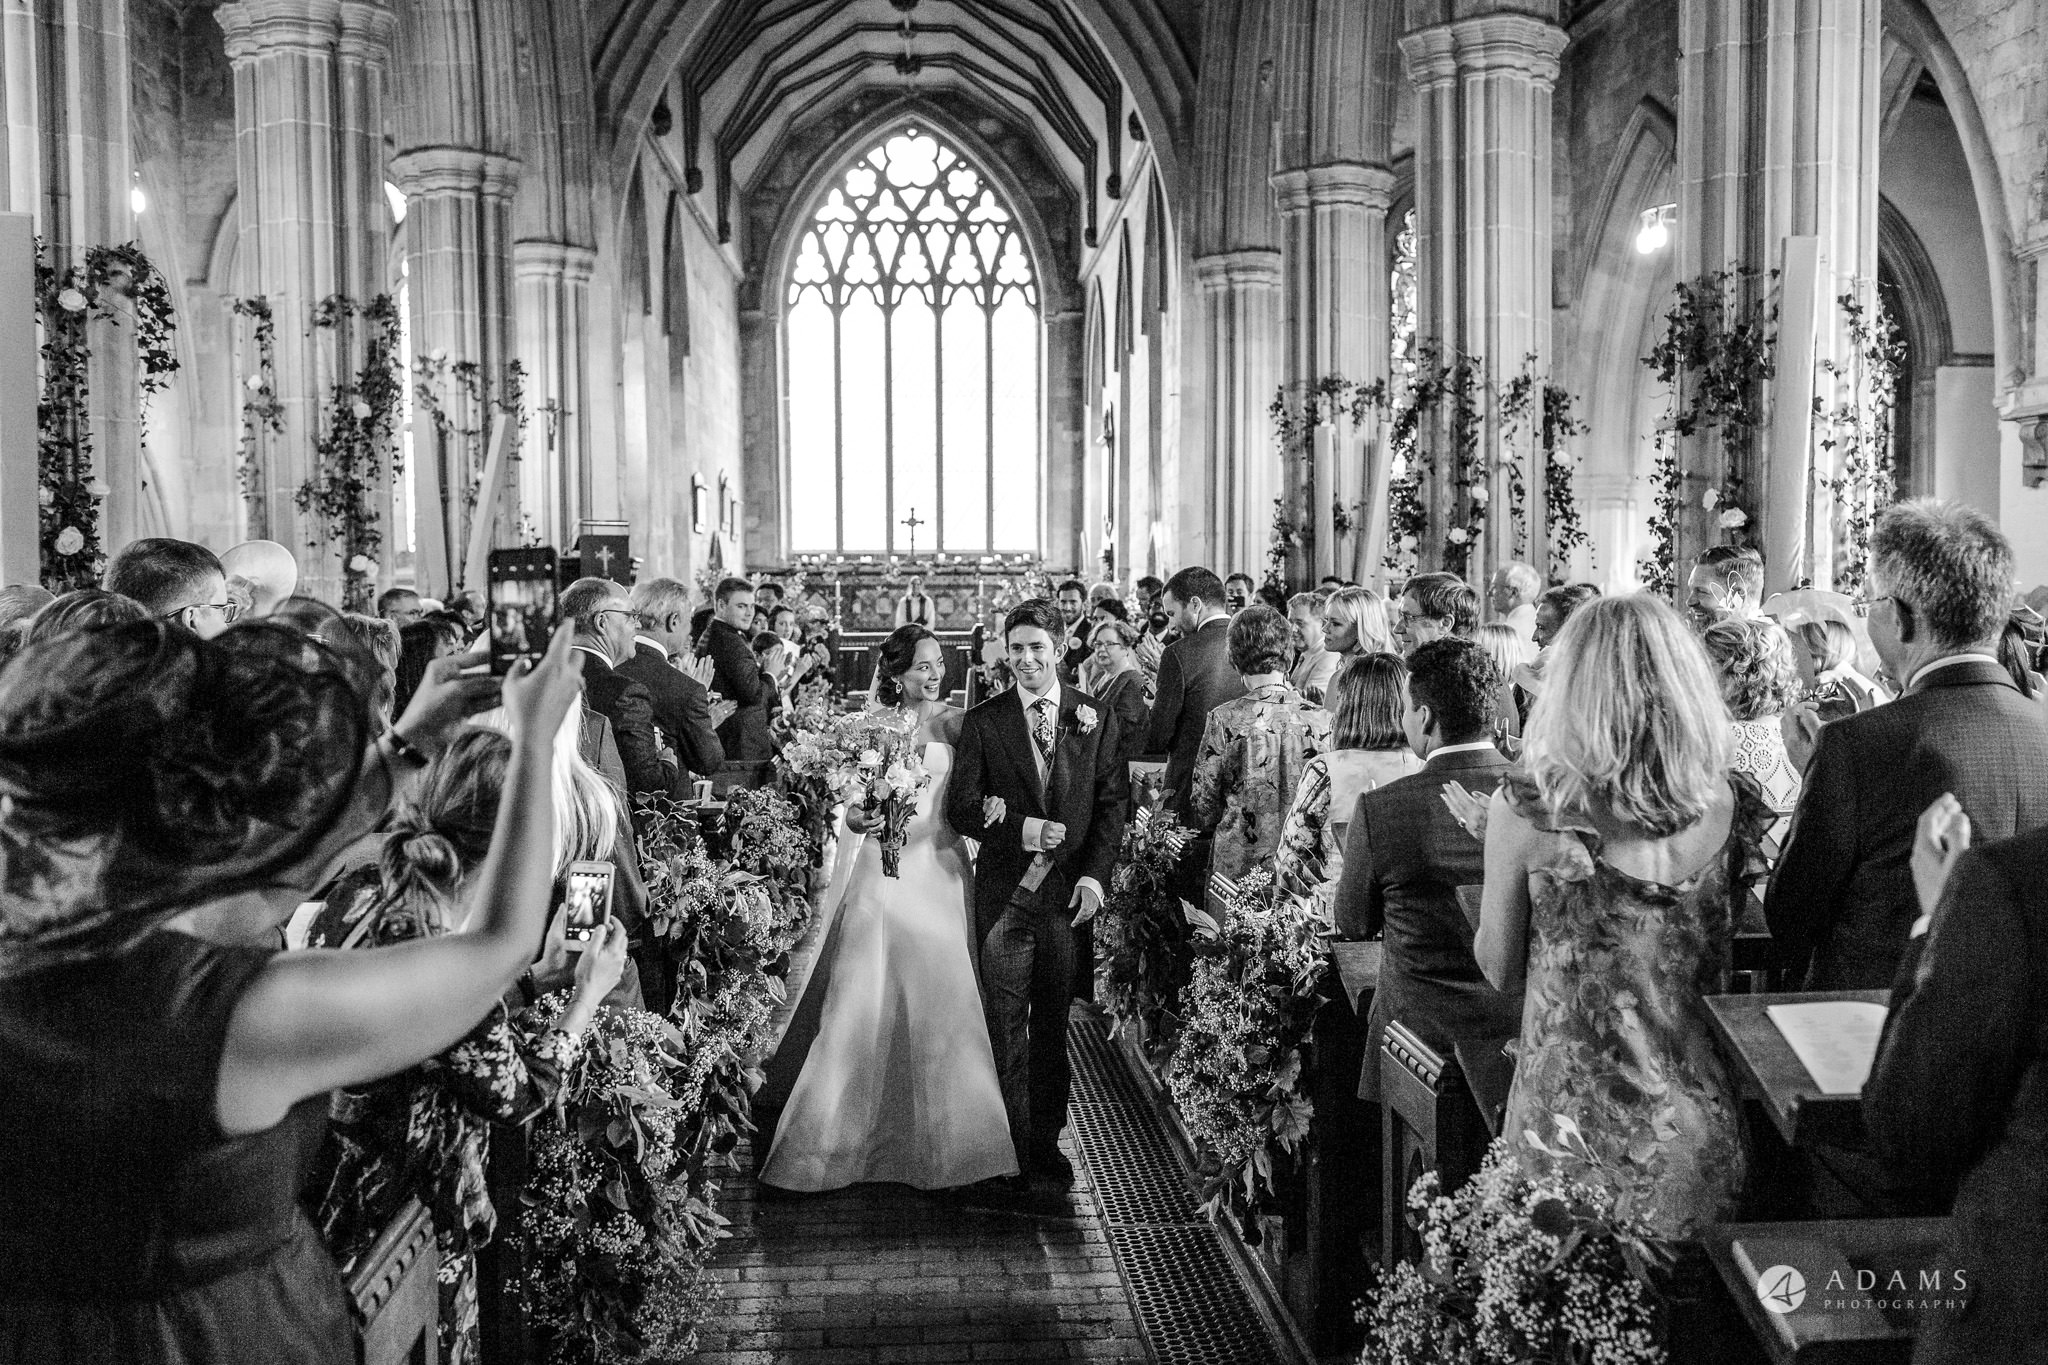 Trinity College Cambridge wedding bride and groom leave the church